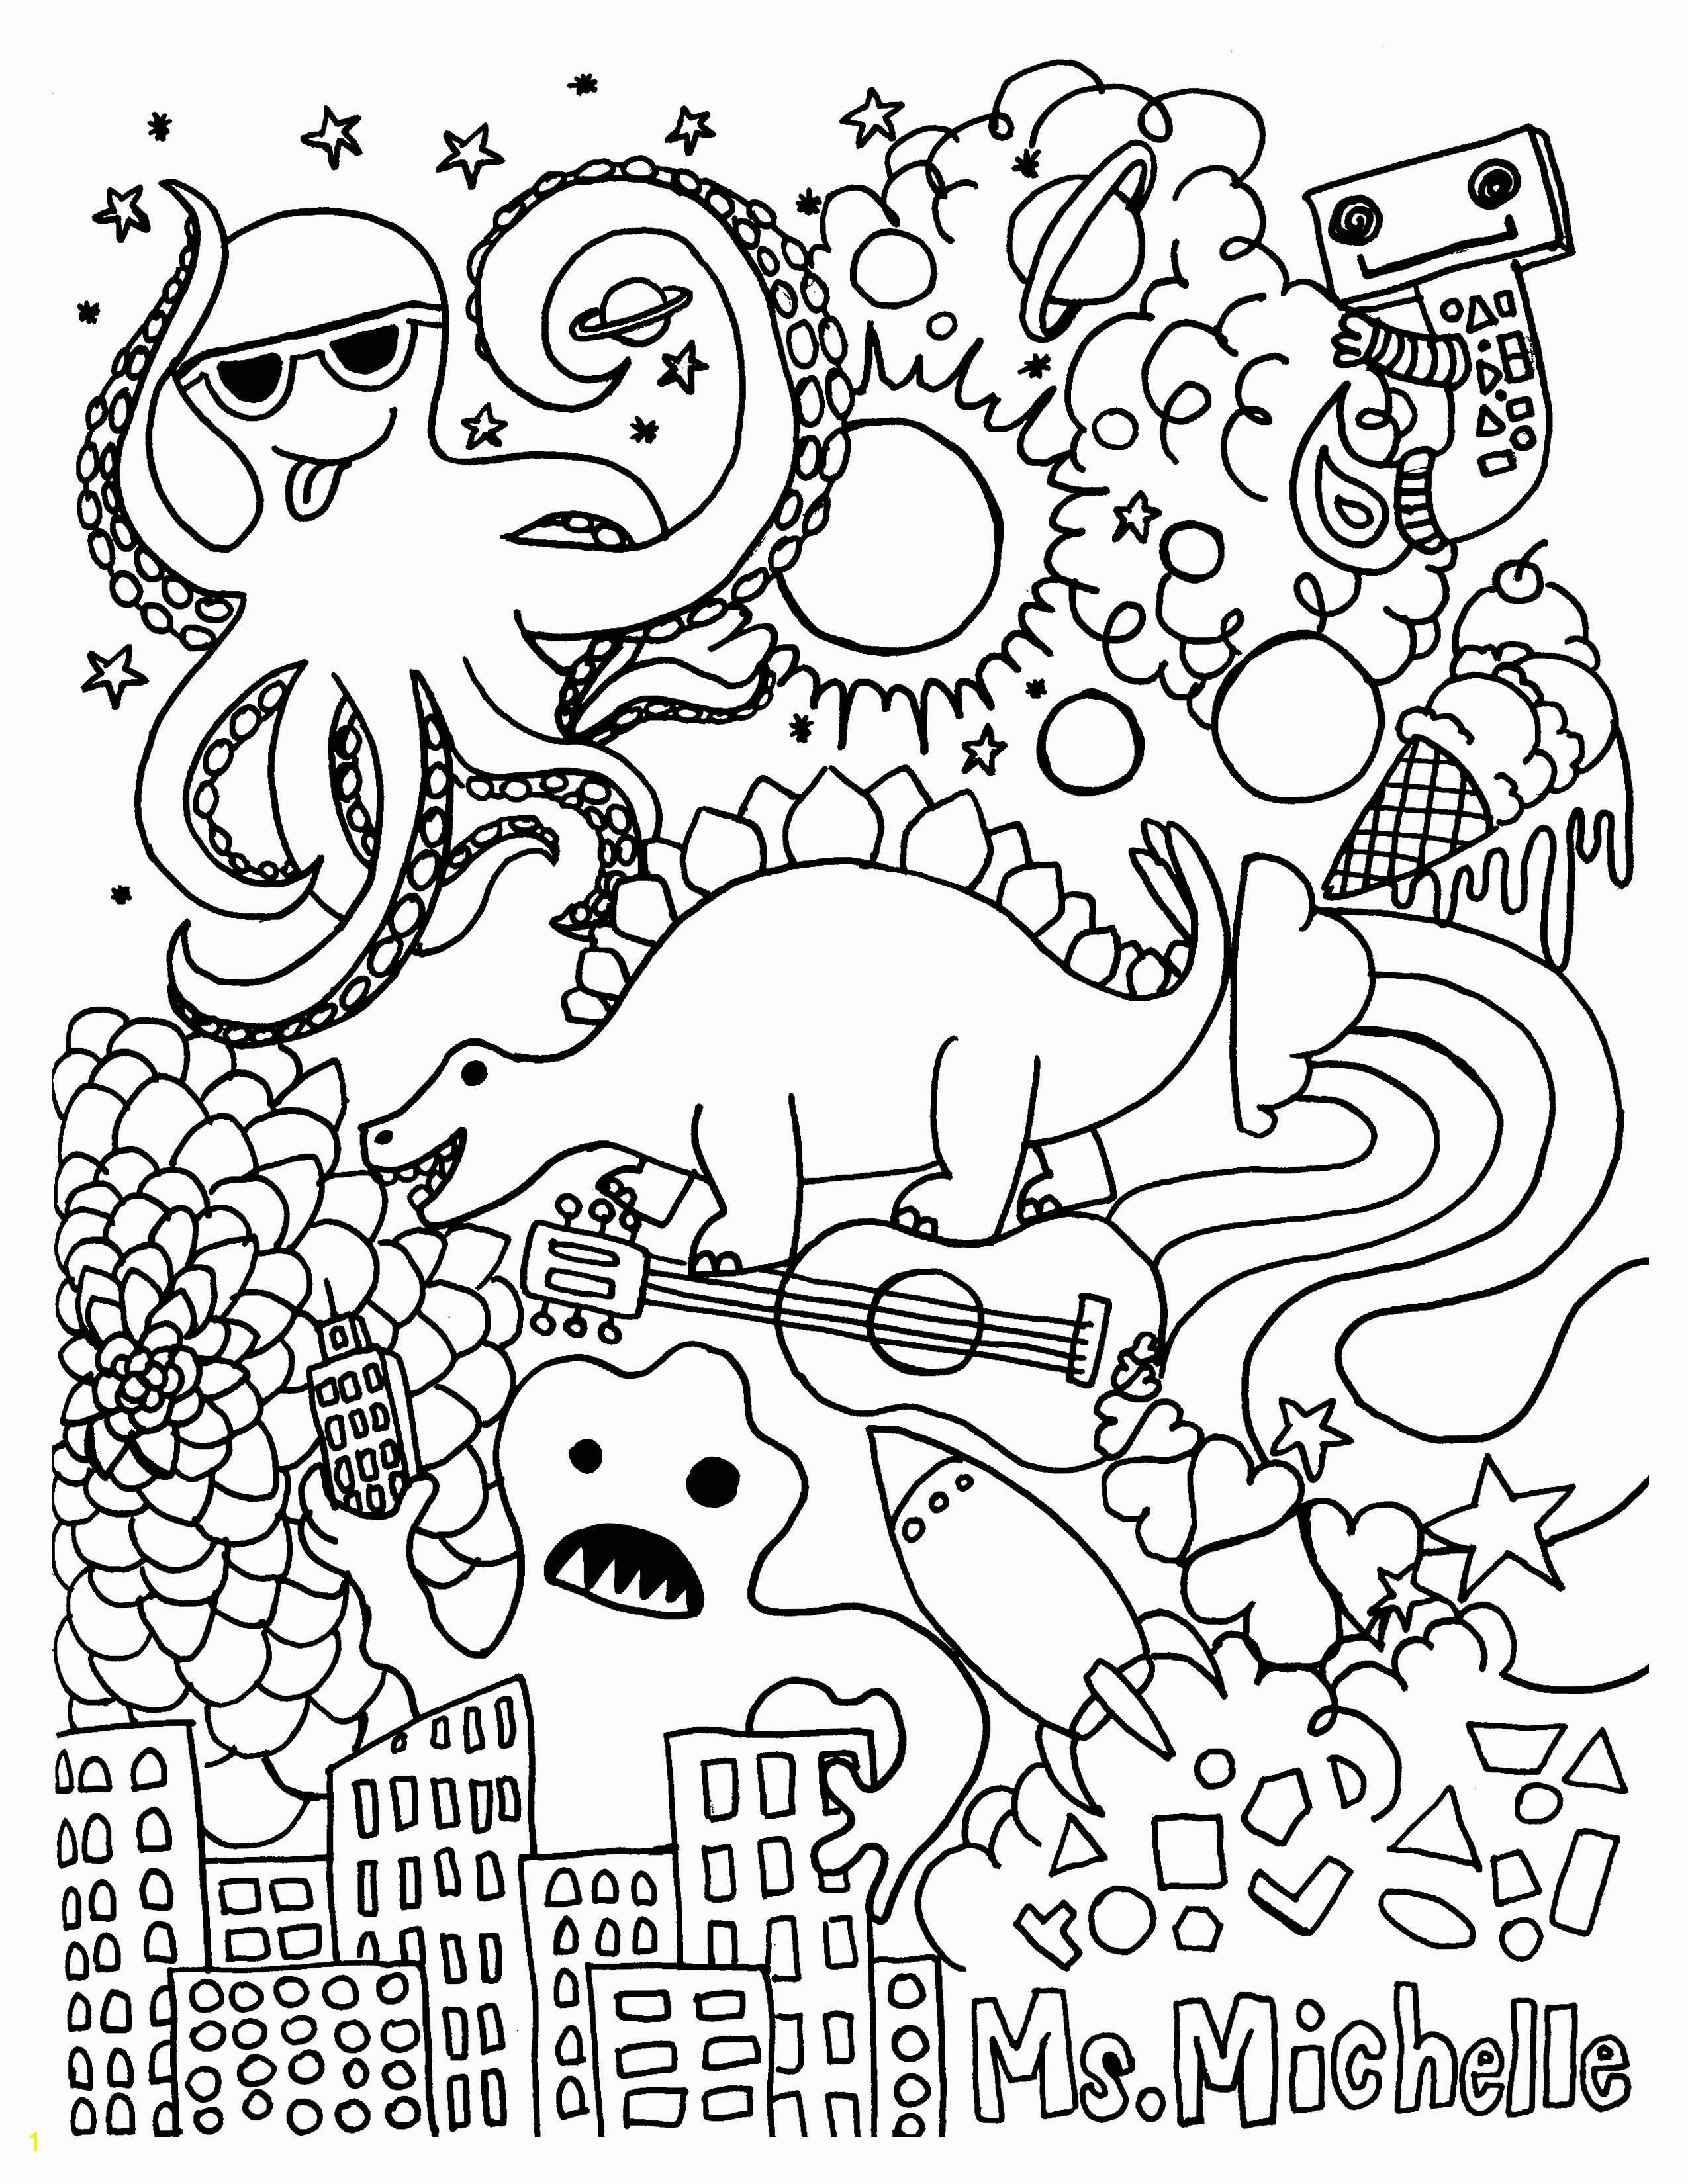 Mario Coloring Pages Free Printable Inspirational Donkey Kong Elegant Donkey Kong Ausmalbilder